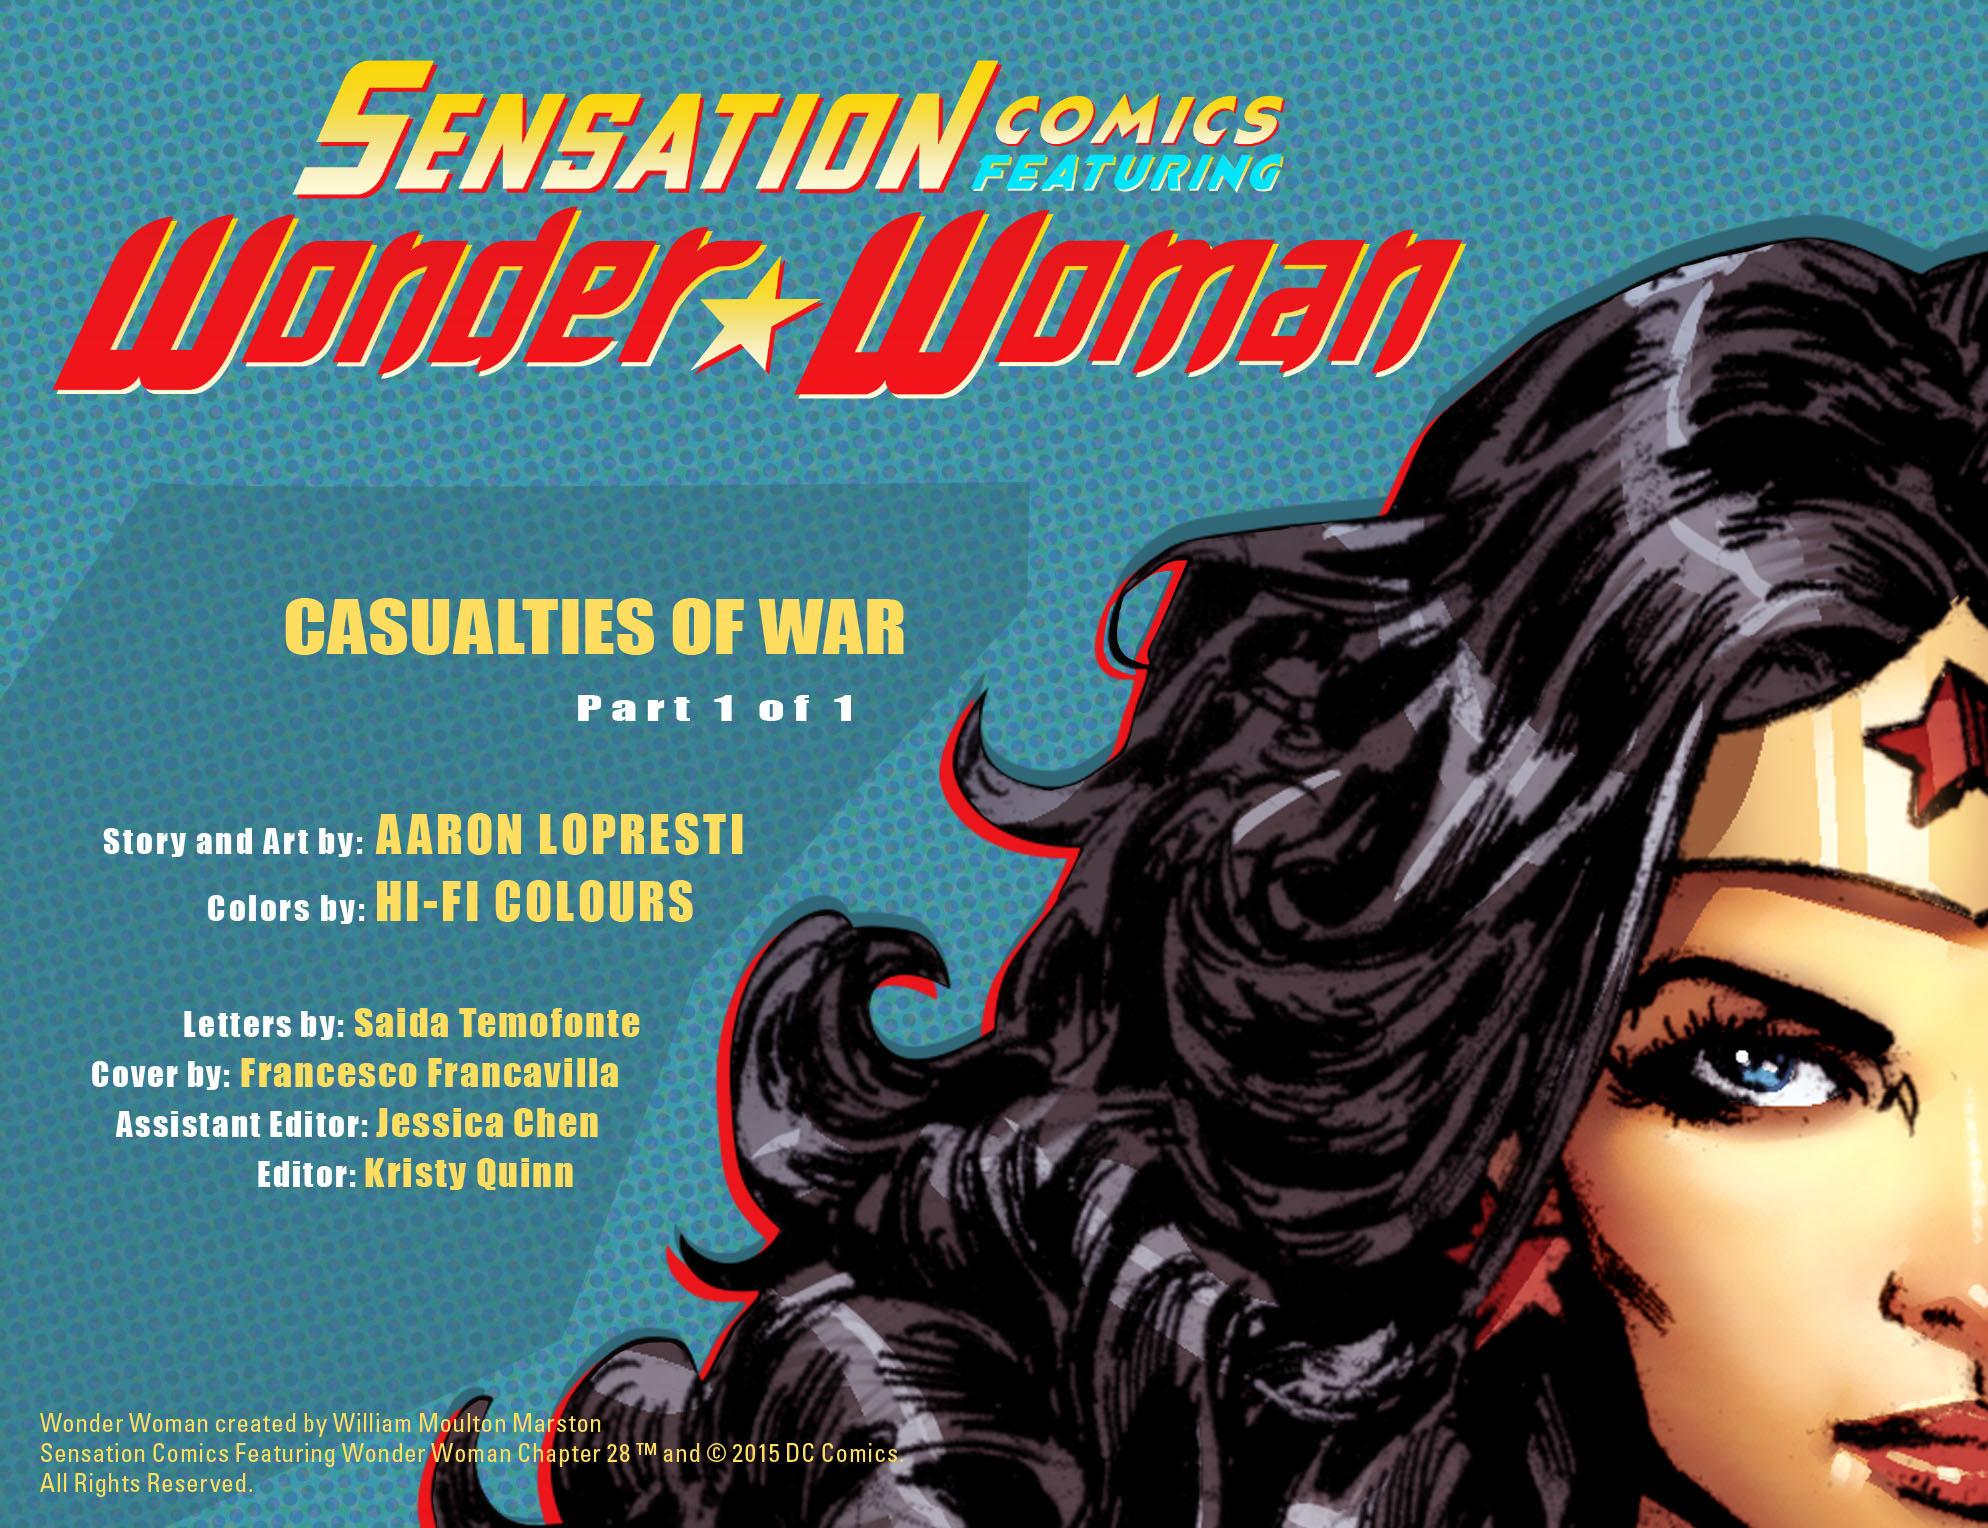 Read online Sensation Comics Featuring Wonder Woman comic -  Issue #28 - 2